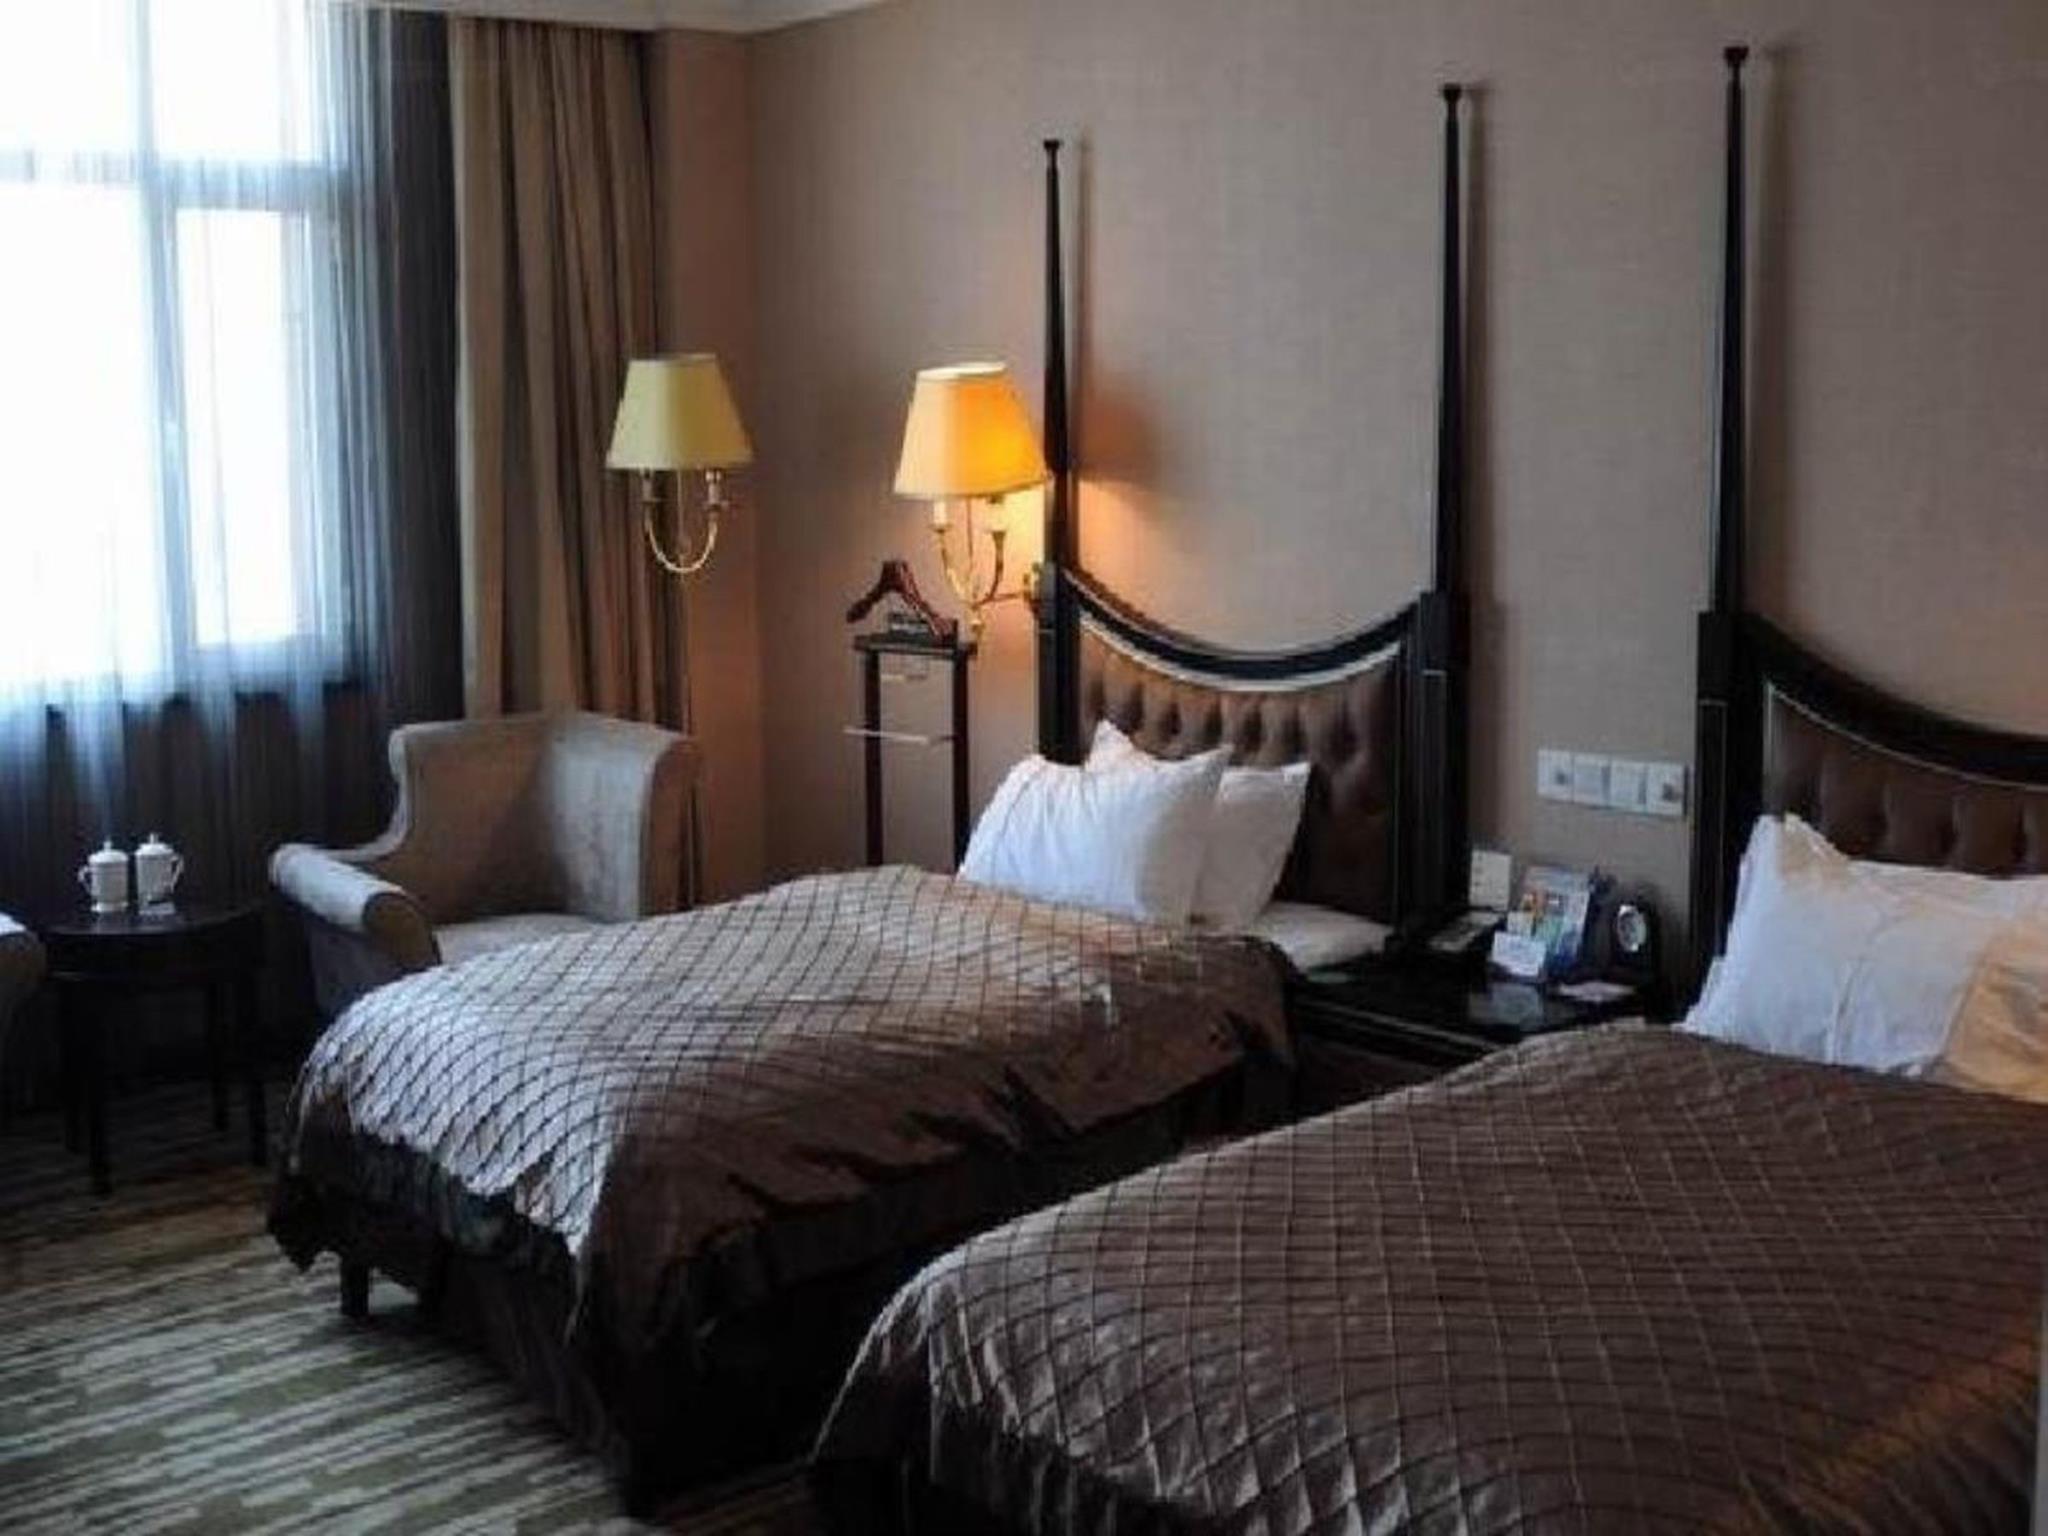 青岛多瑙河国际大酒店 (qingdao danube international hotel)